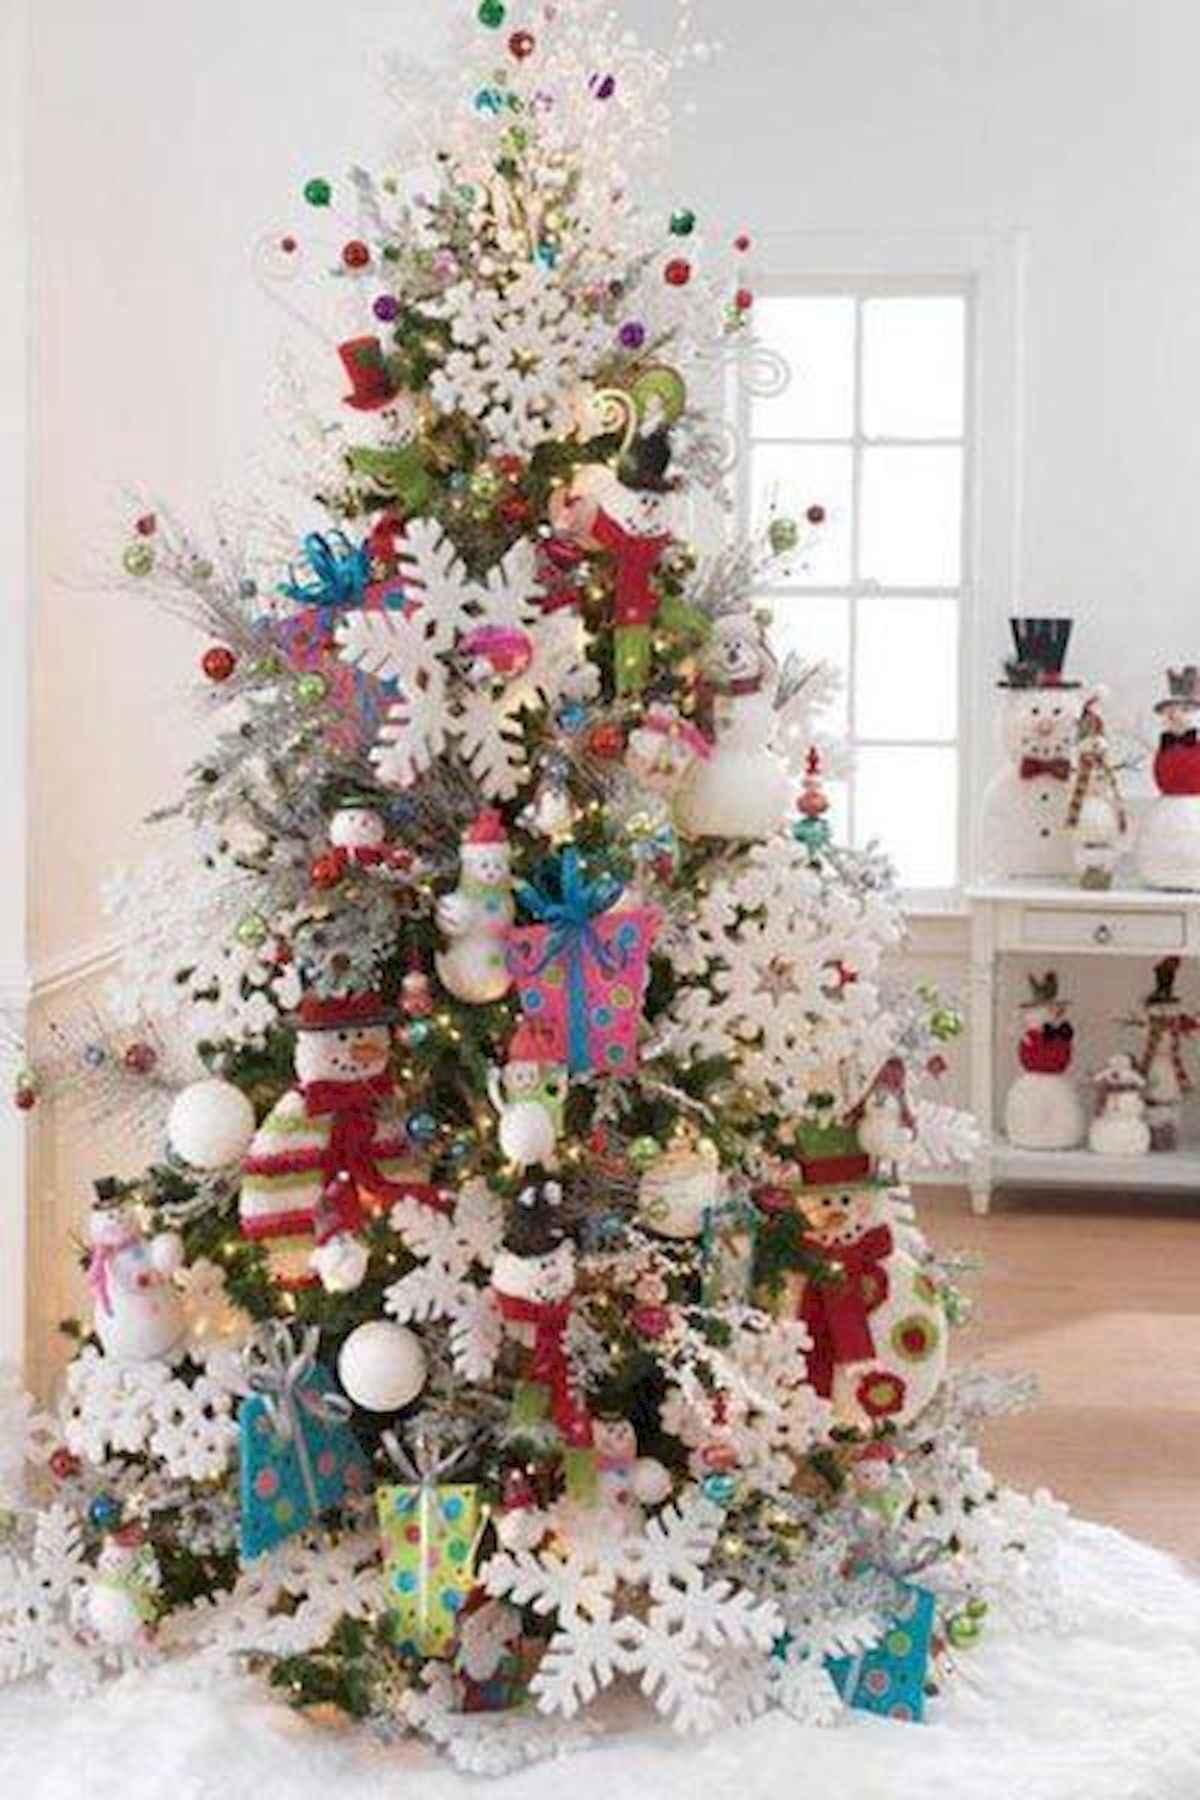 40 elegant christmas tree decorations ideas (19)